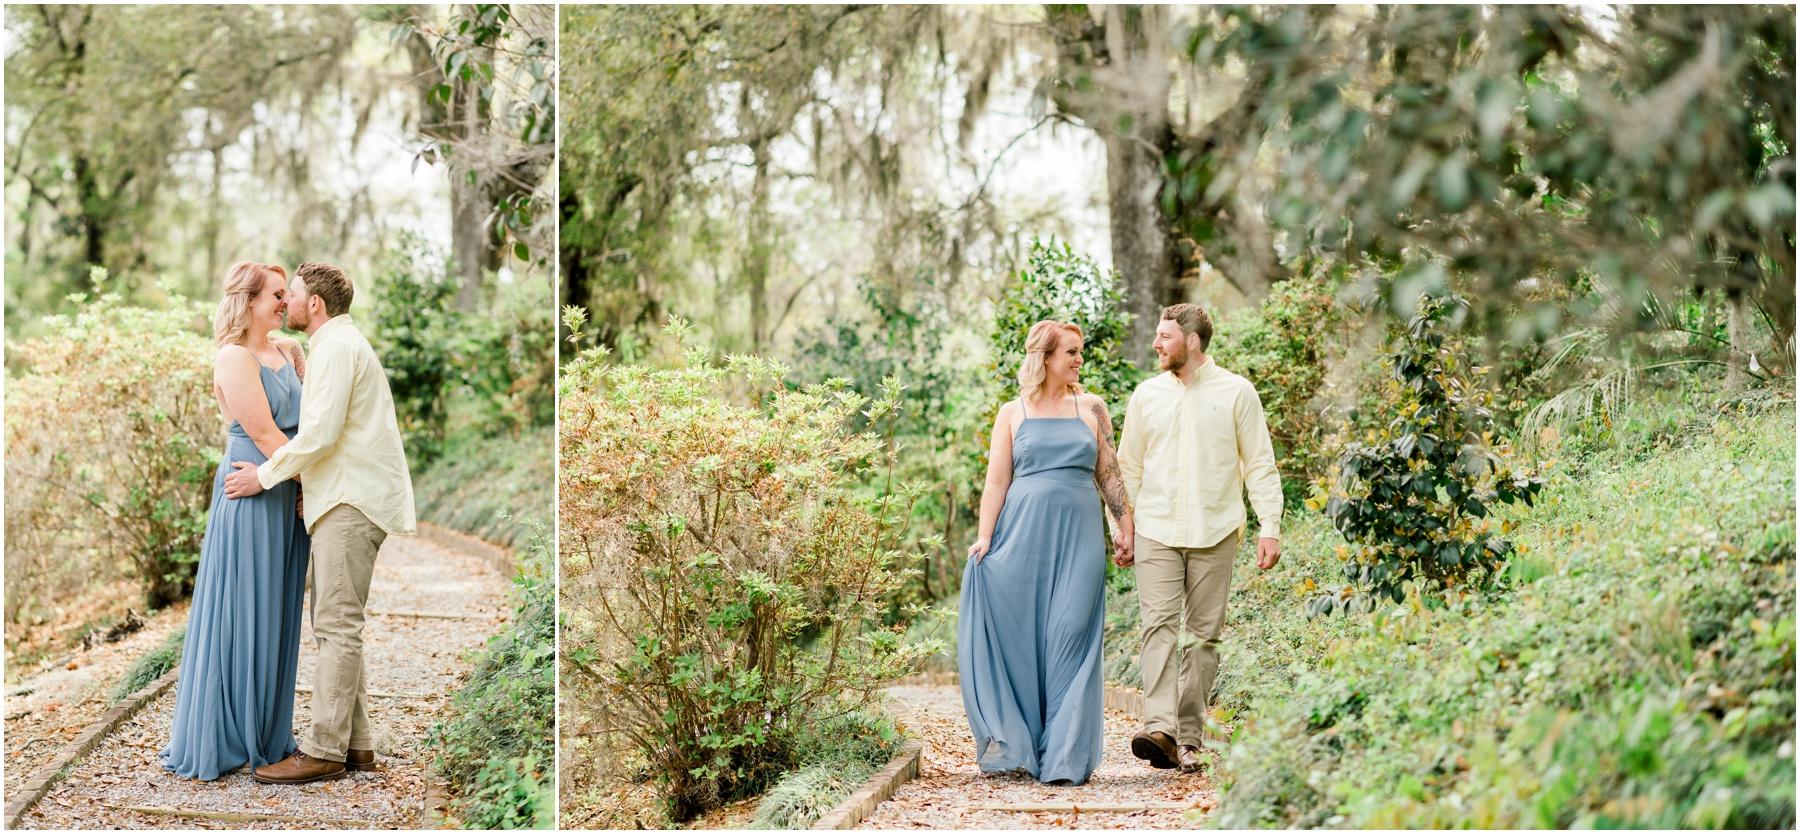 Mepkin-Abbey-Moncks-Corner-South-Carolina-Engagement-Session-Photos_0017.jpg